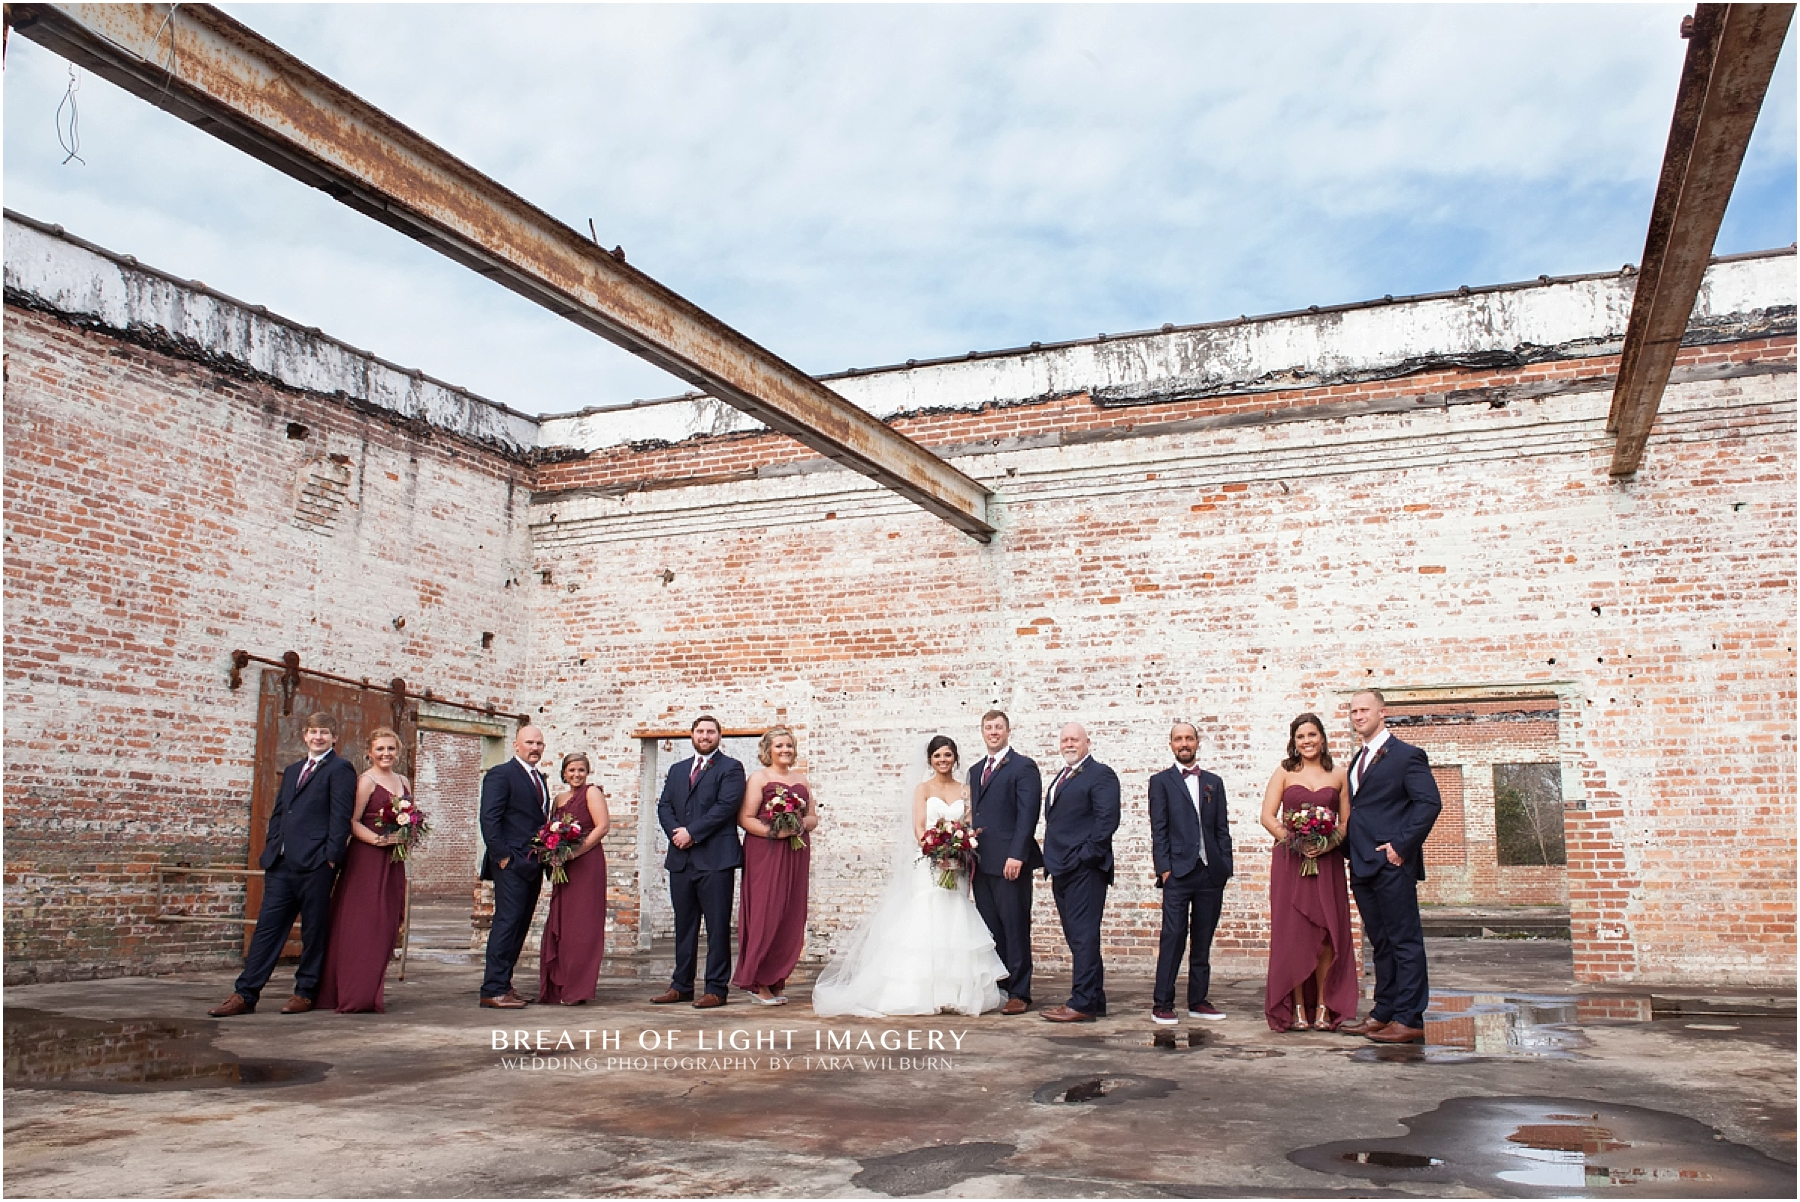 AKIN_wedding_03182017-384.jpg